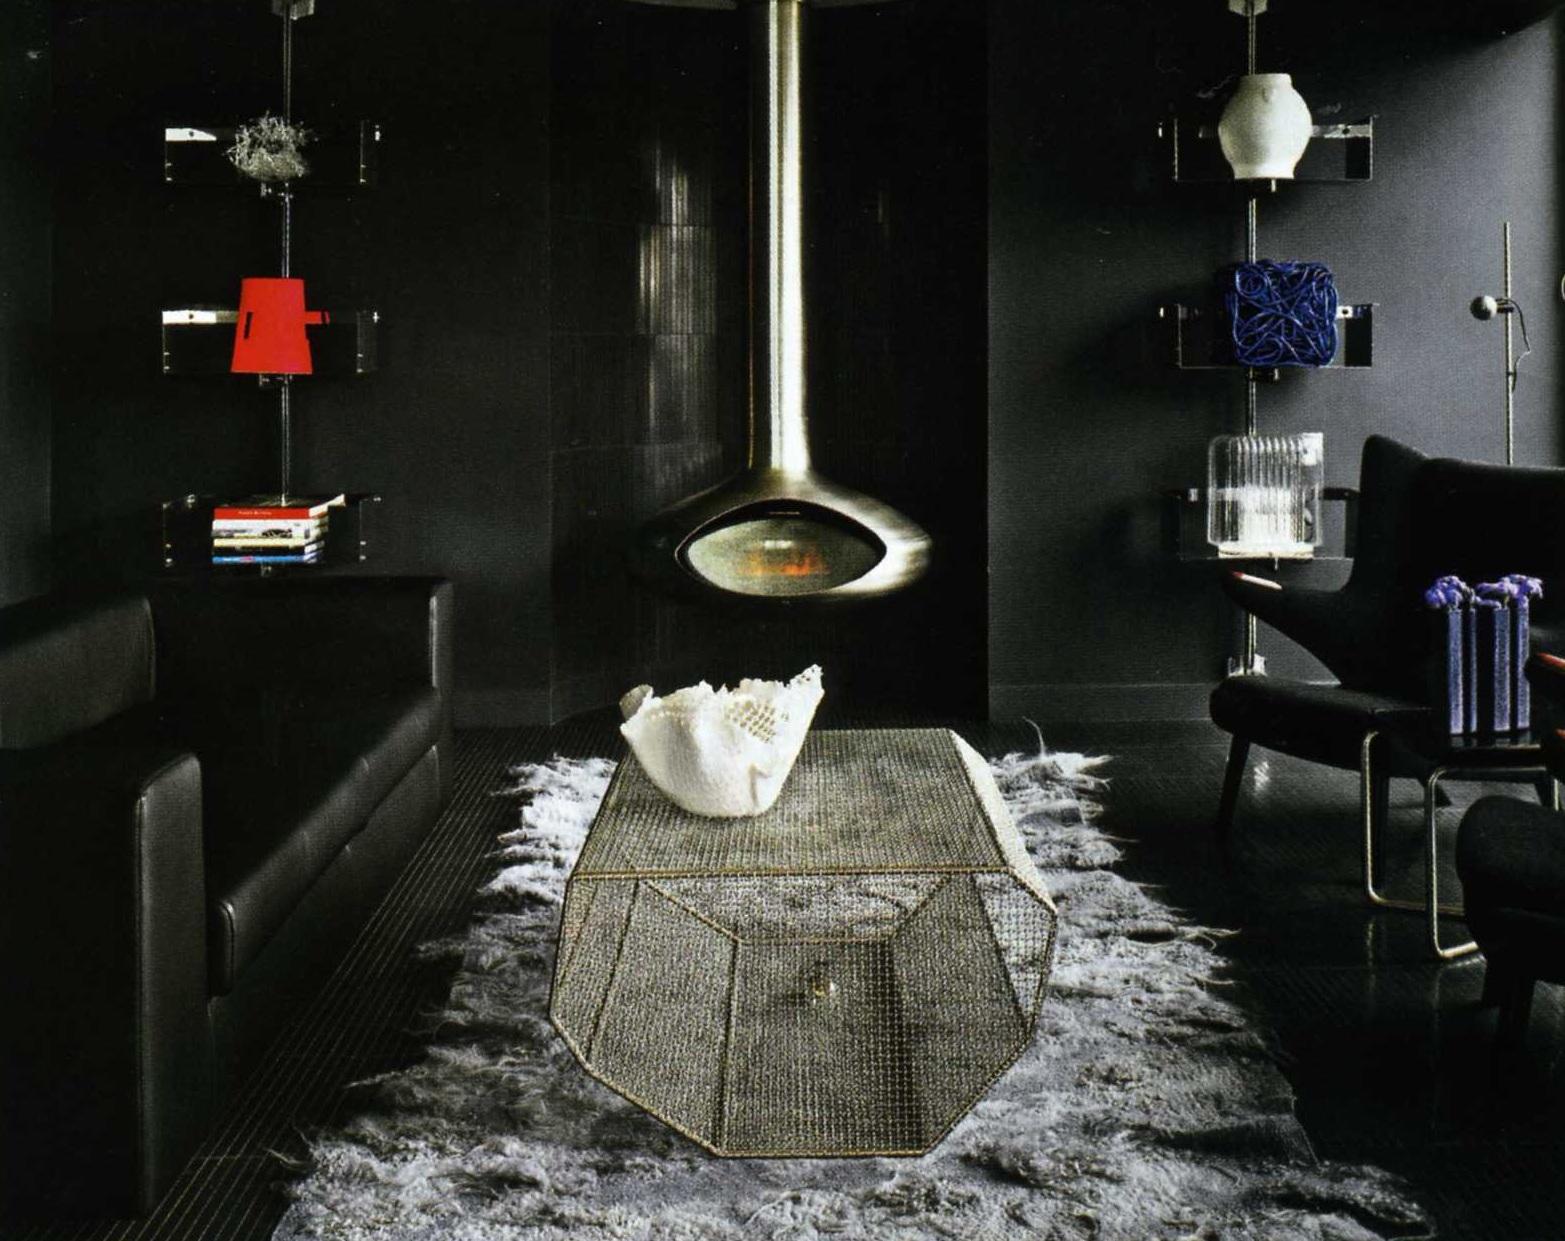 Brynnalden interiors llc paint colors light vs dark for Paint colors to lighten a dark room